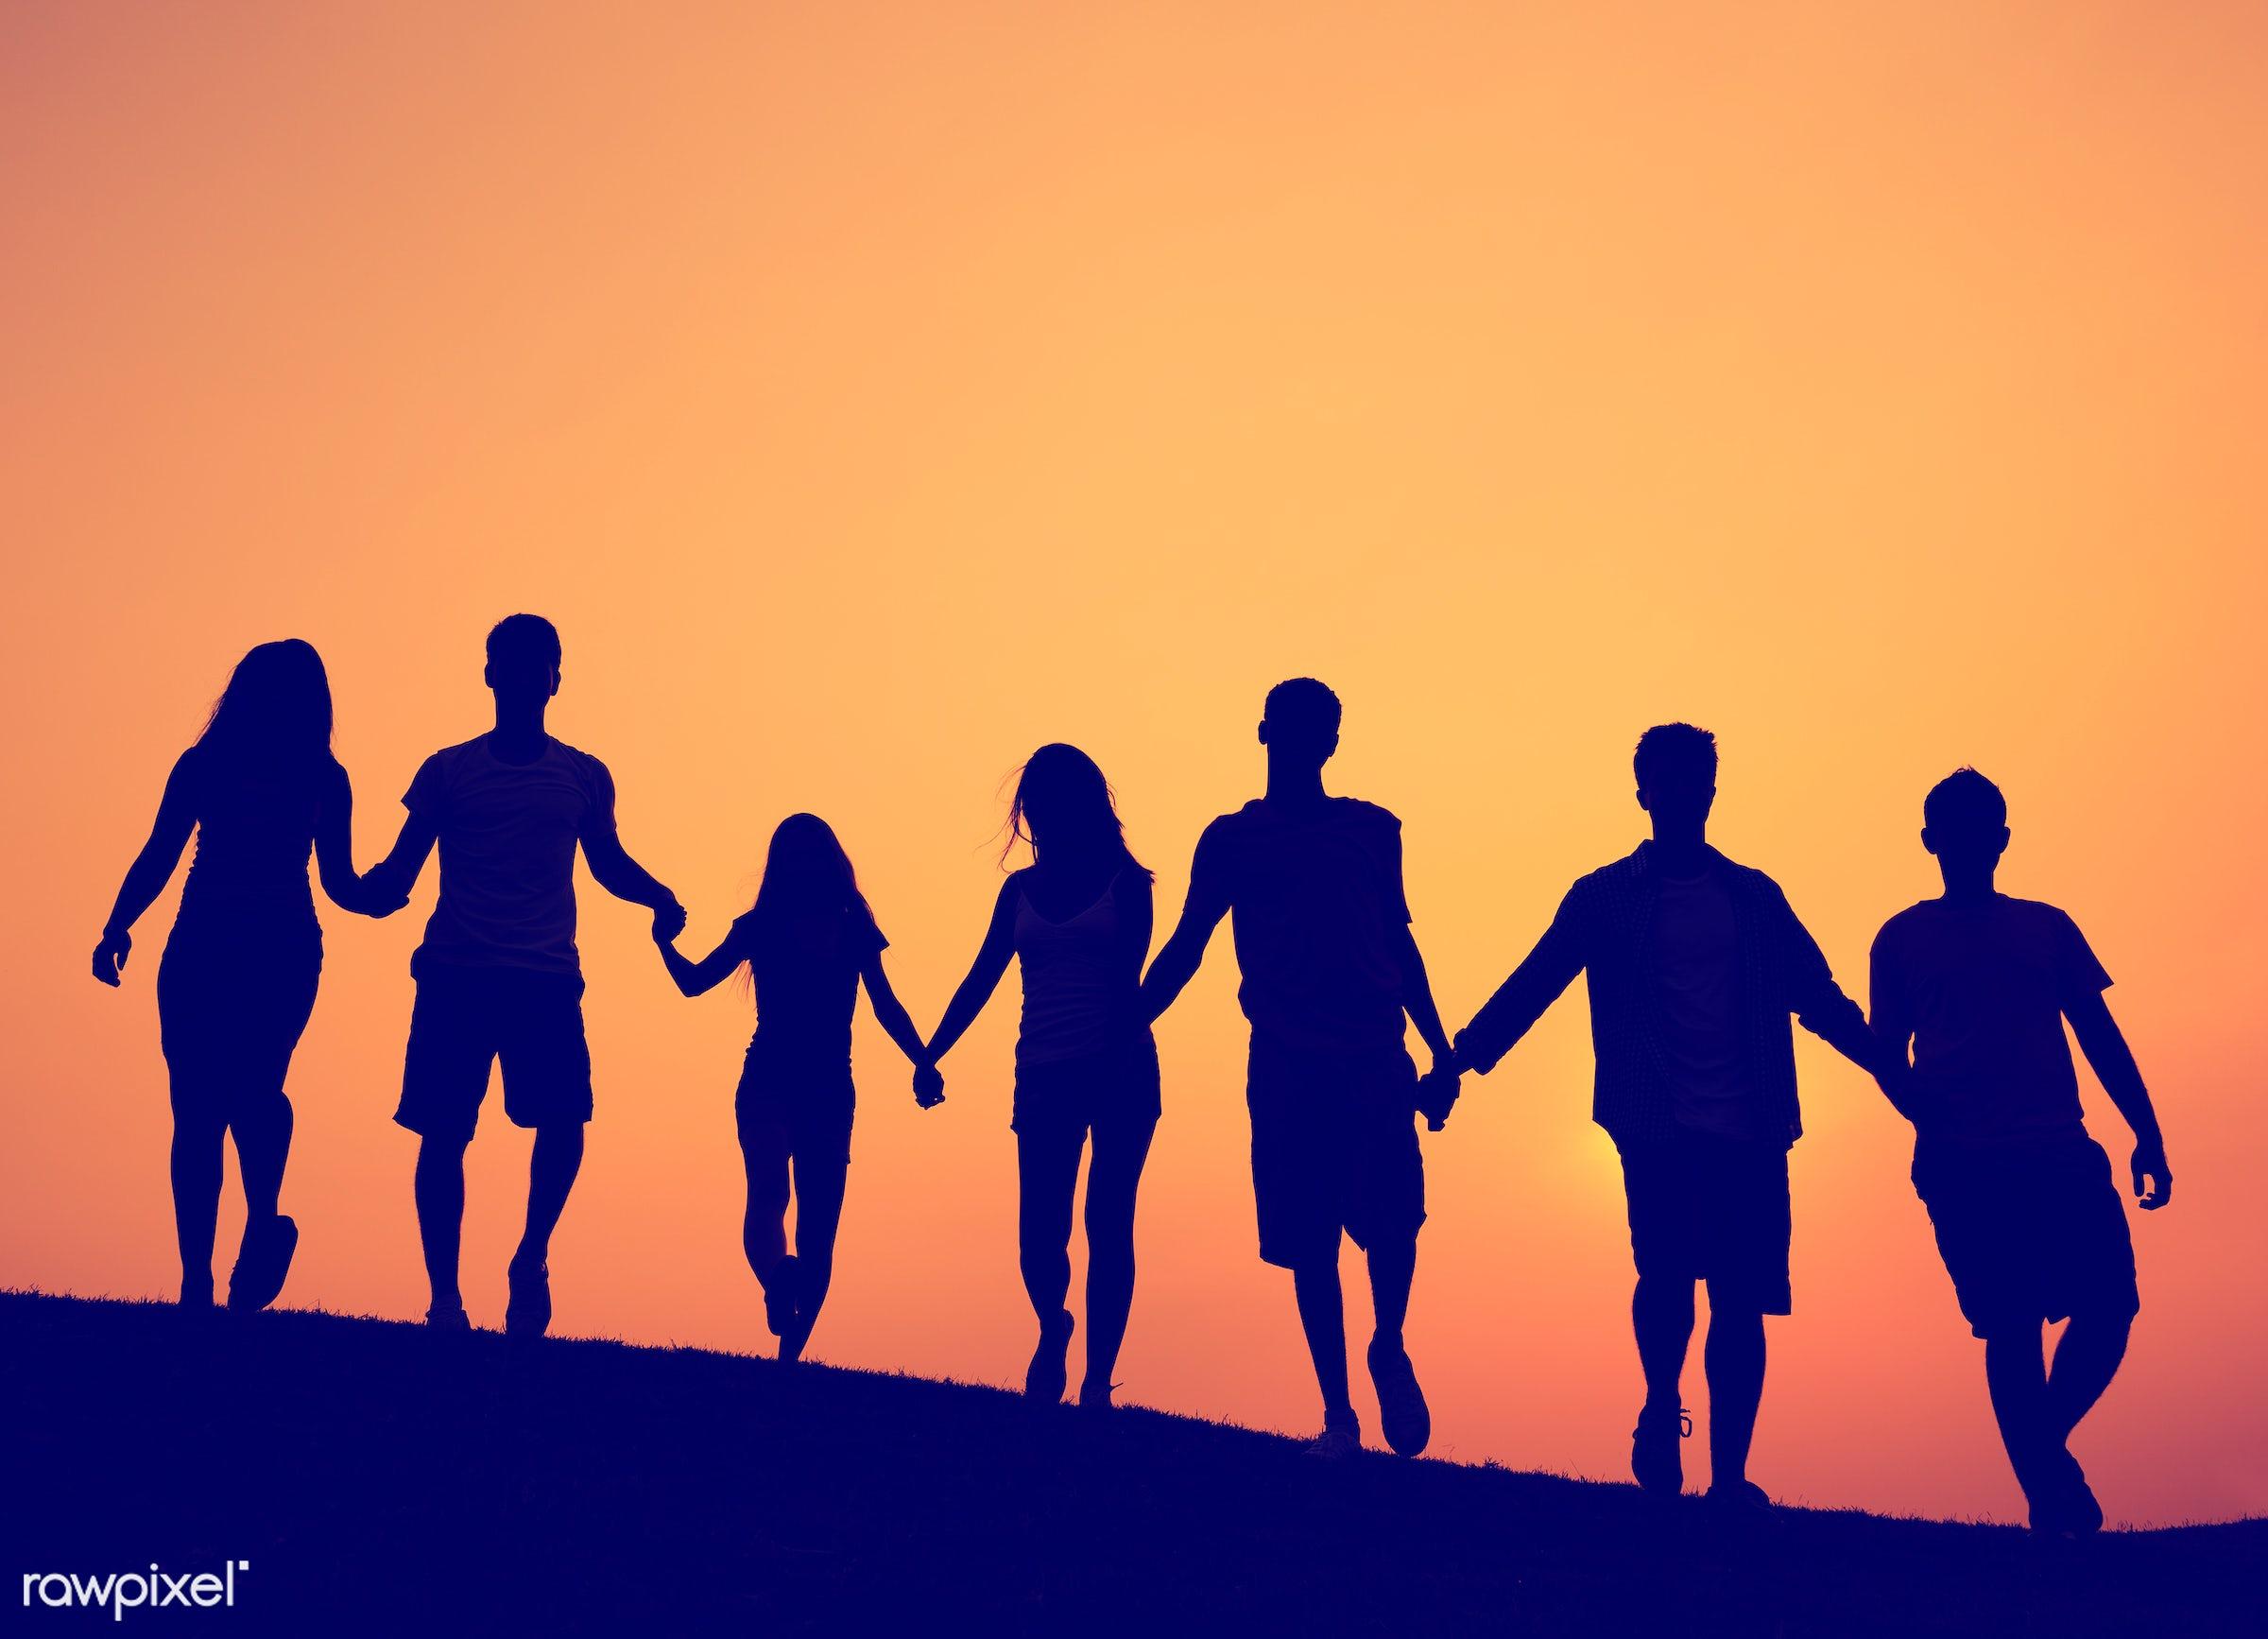 backlit, celebration, cheerful, community, confidence, cooperation, enjoyment, environment, field, friends, friendship,...